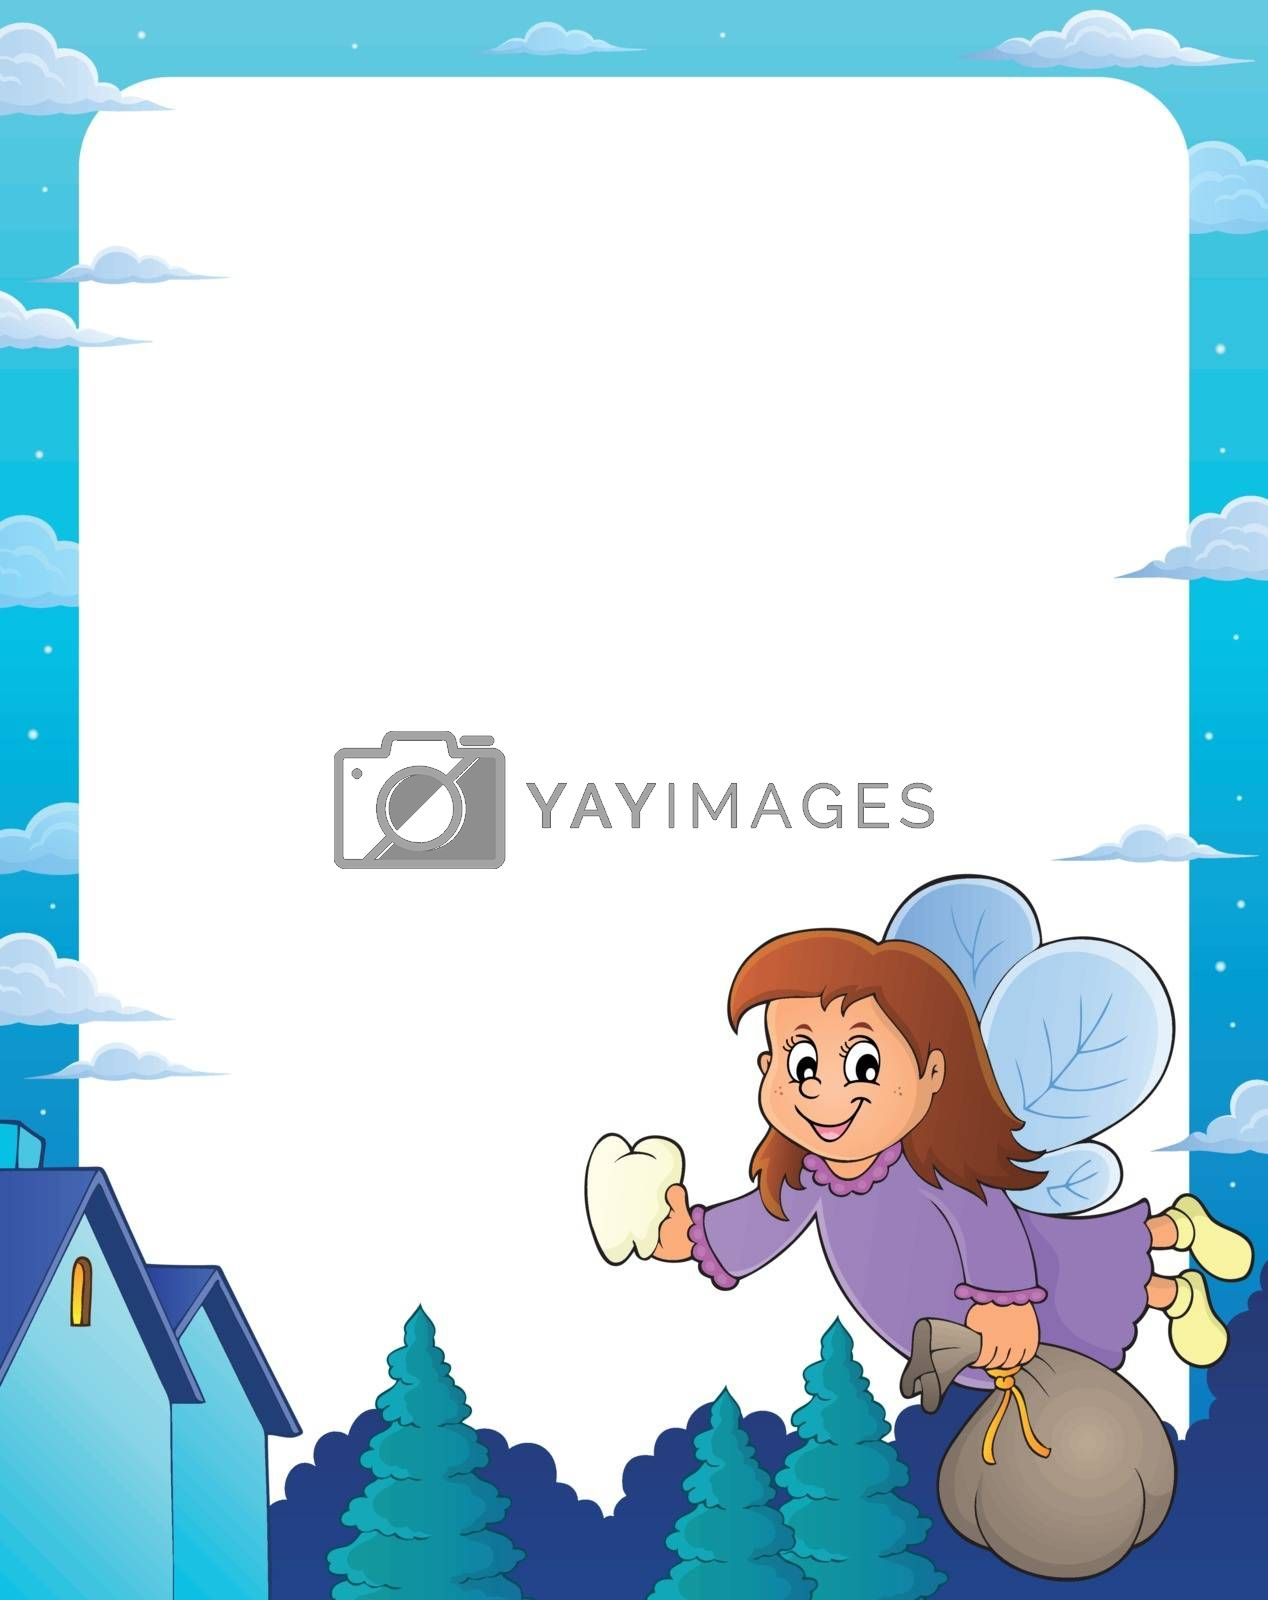 Tooth fairy theme frame 1 - eps10 vector illustration.